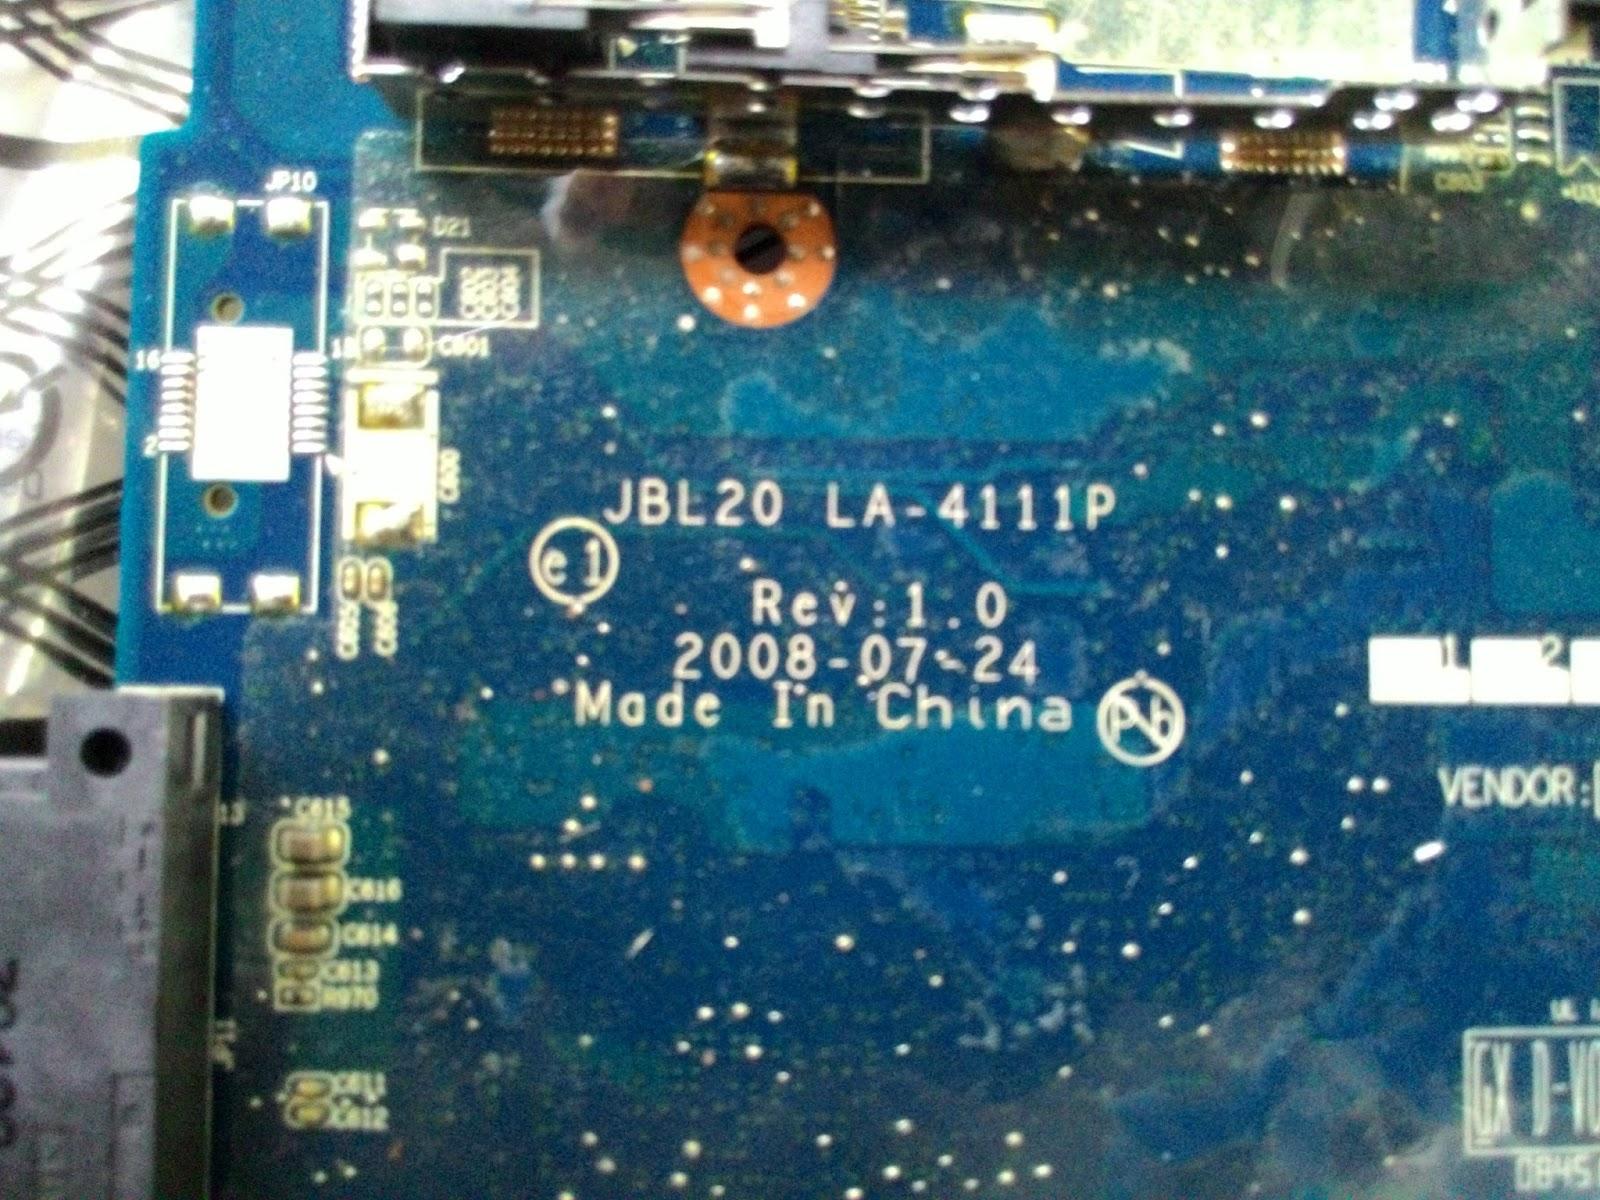 Compaq Presario CQ40 notebook cpu cooling fan + heatsink (Intel